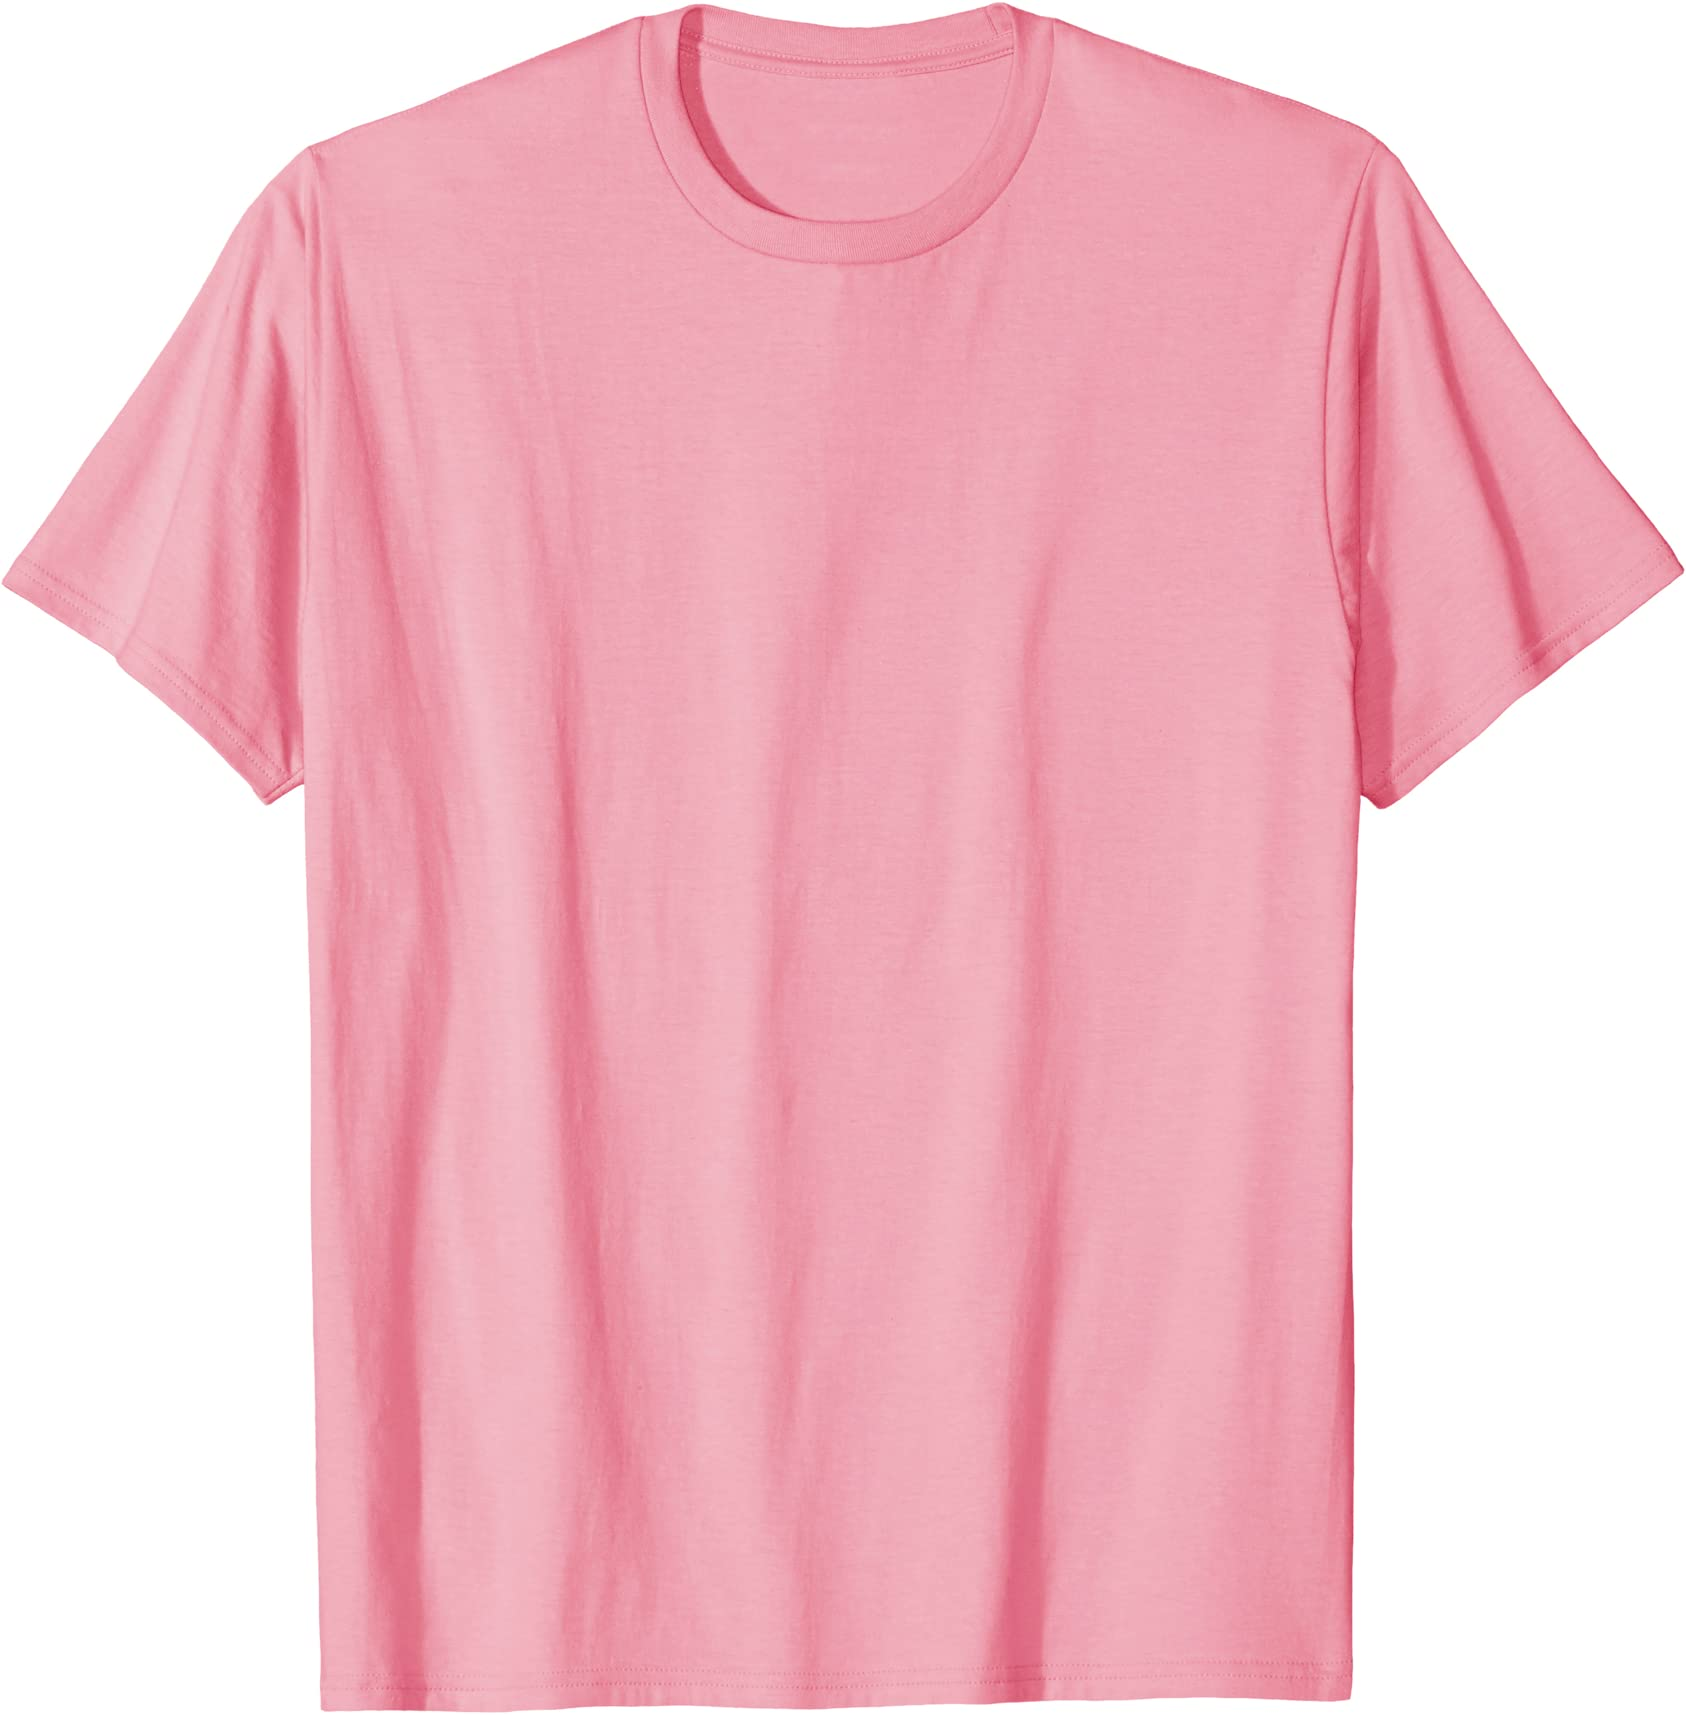 Disney T-Shirt Bimbo